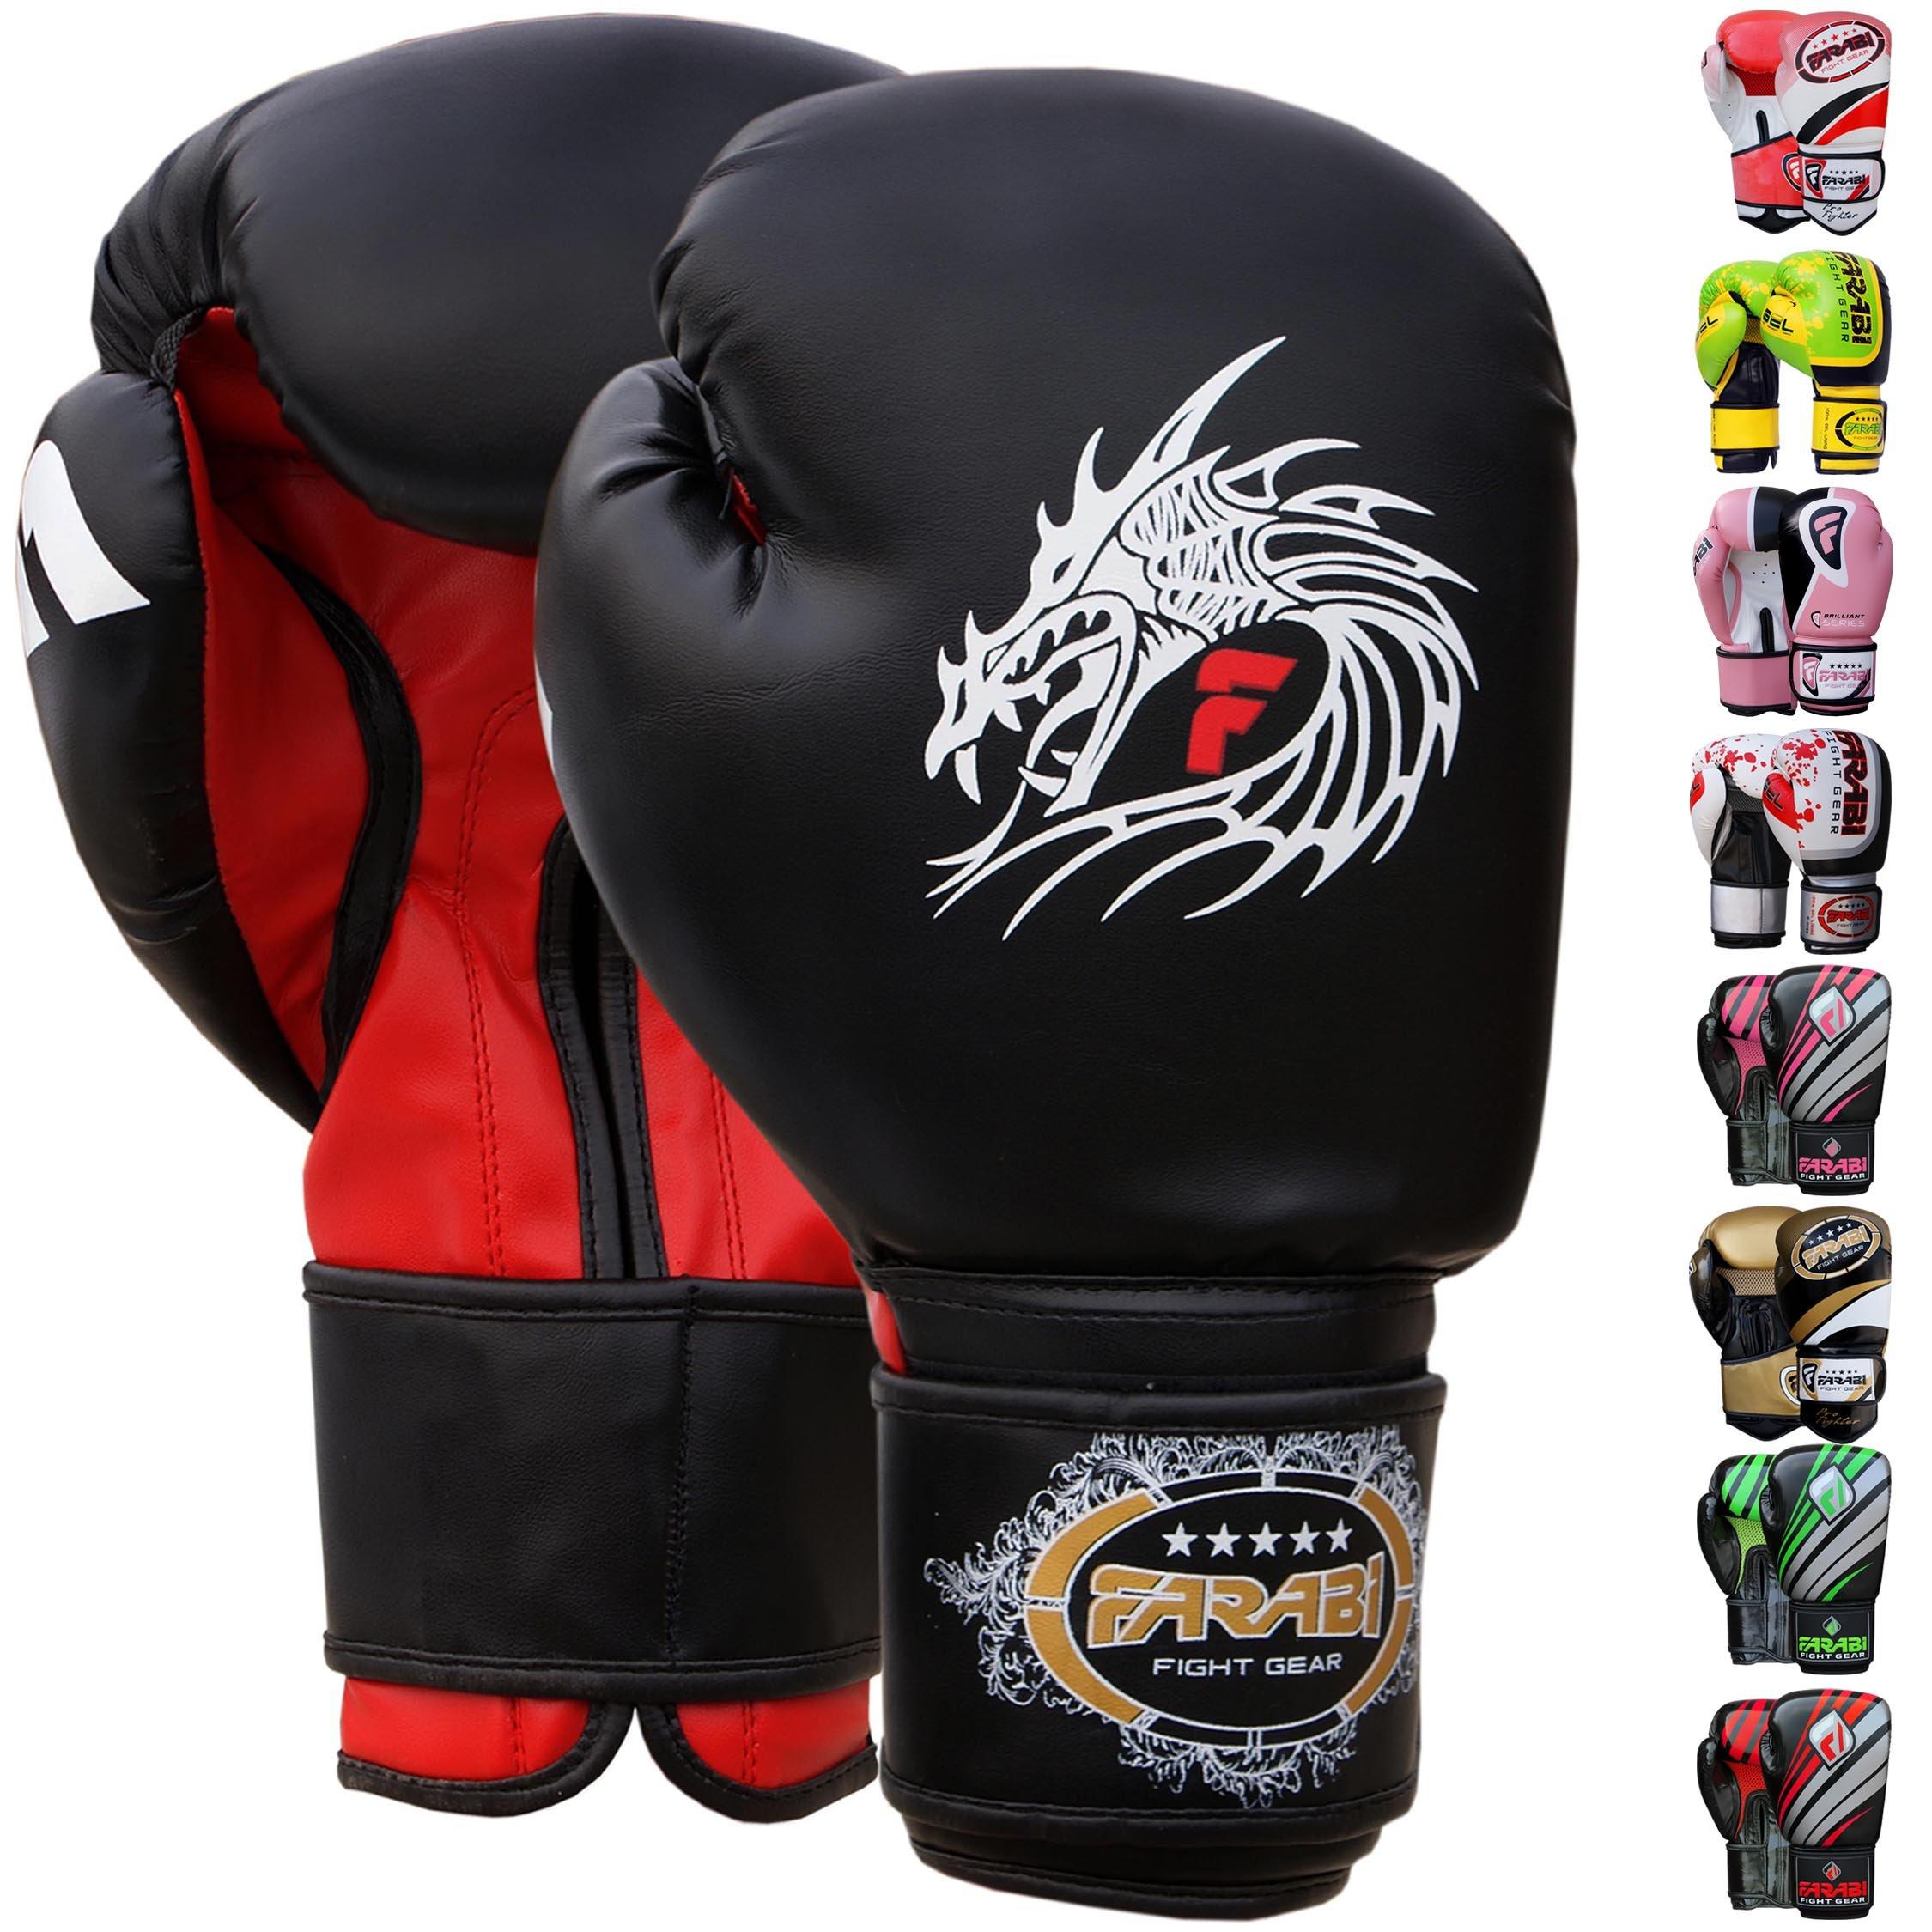 Kit of 2 Black Bear Paw Gloves For Boxing Fighting Boxing MMA Muay Thai Karate E